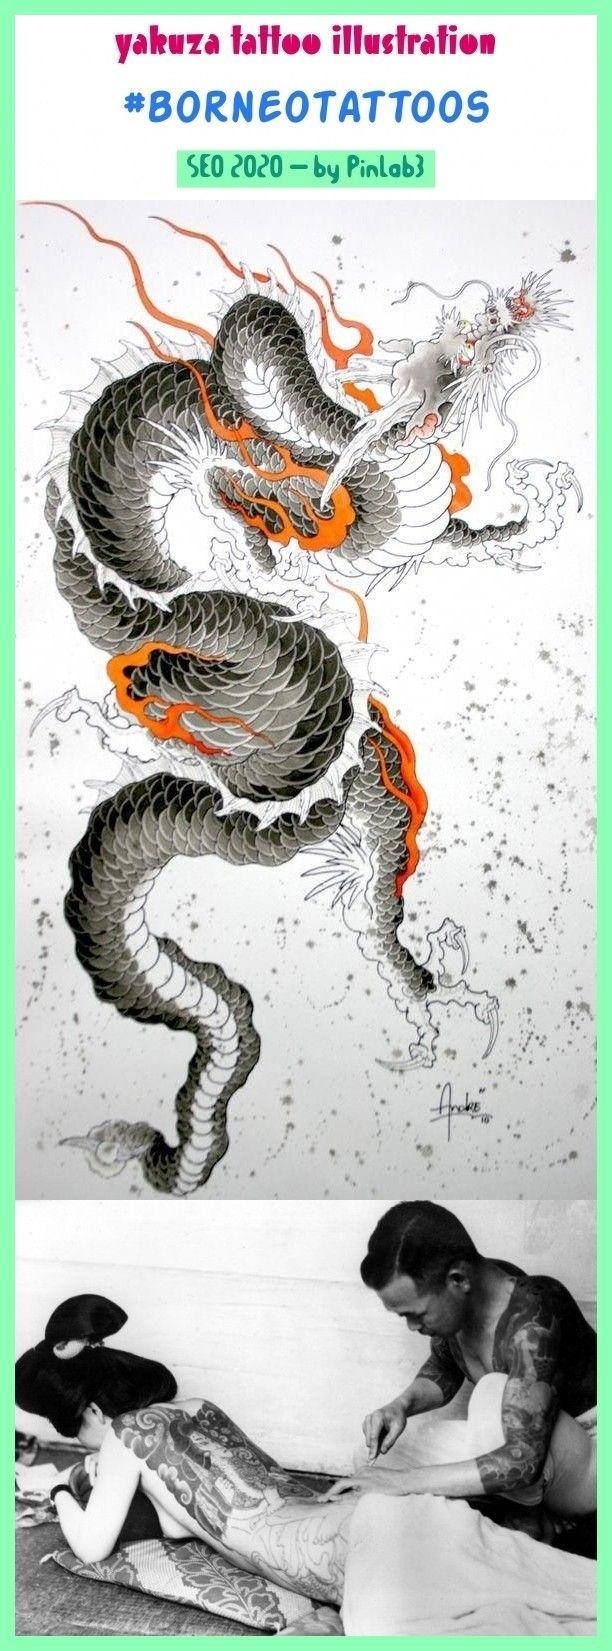 Yakuza tattoo illustration yakuza tattoo illustration